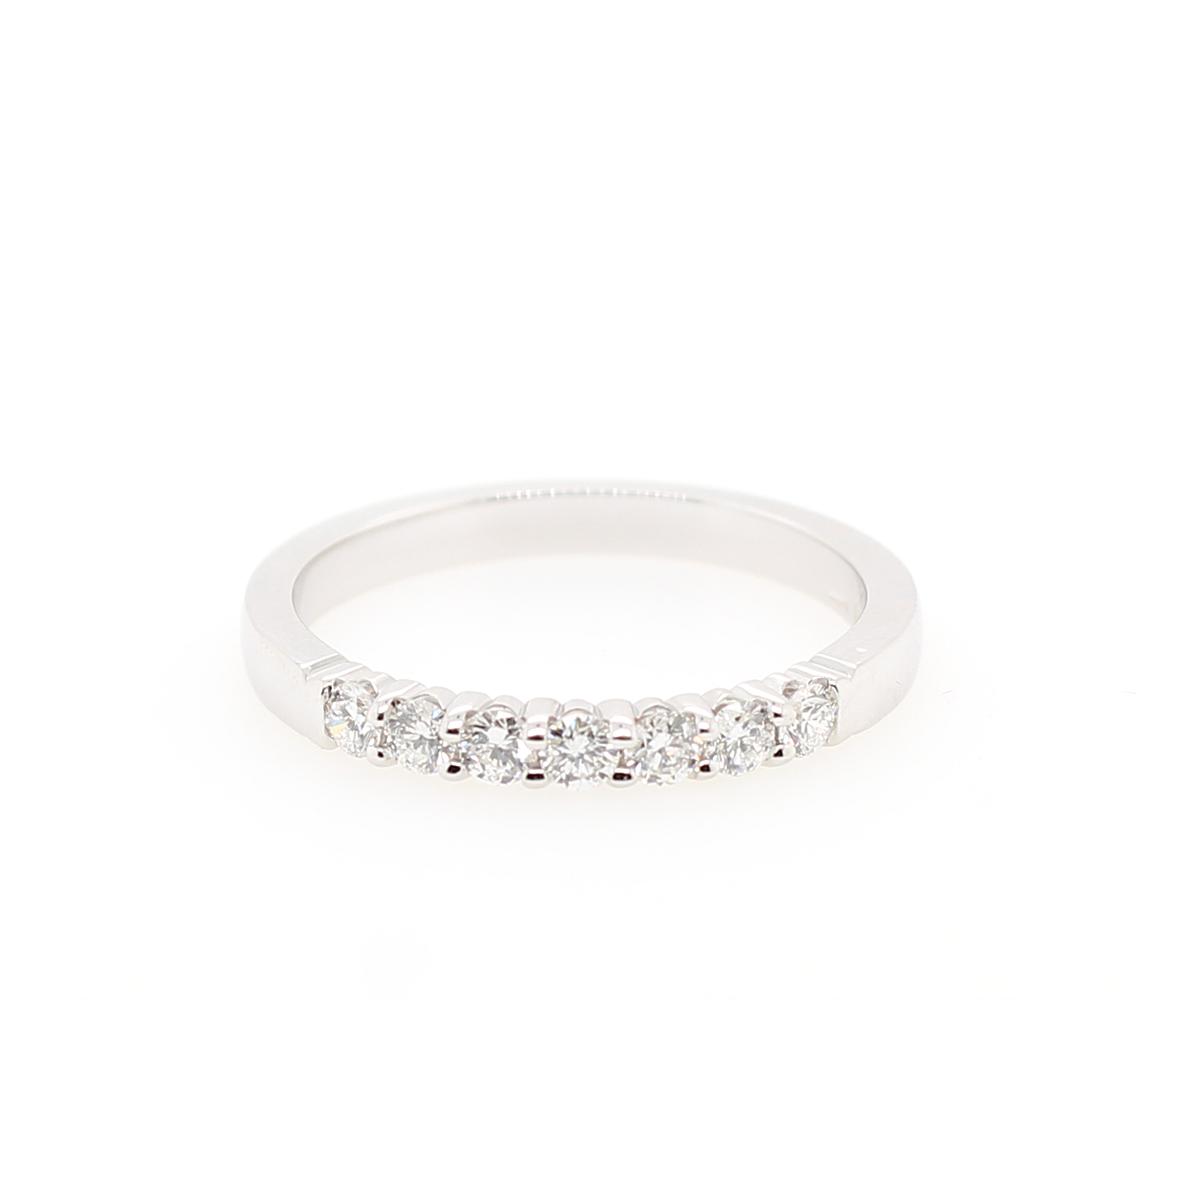 Shefi Diamonds 14 Karat White Gold Diamond Band